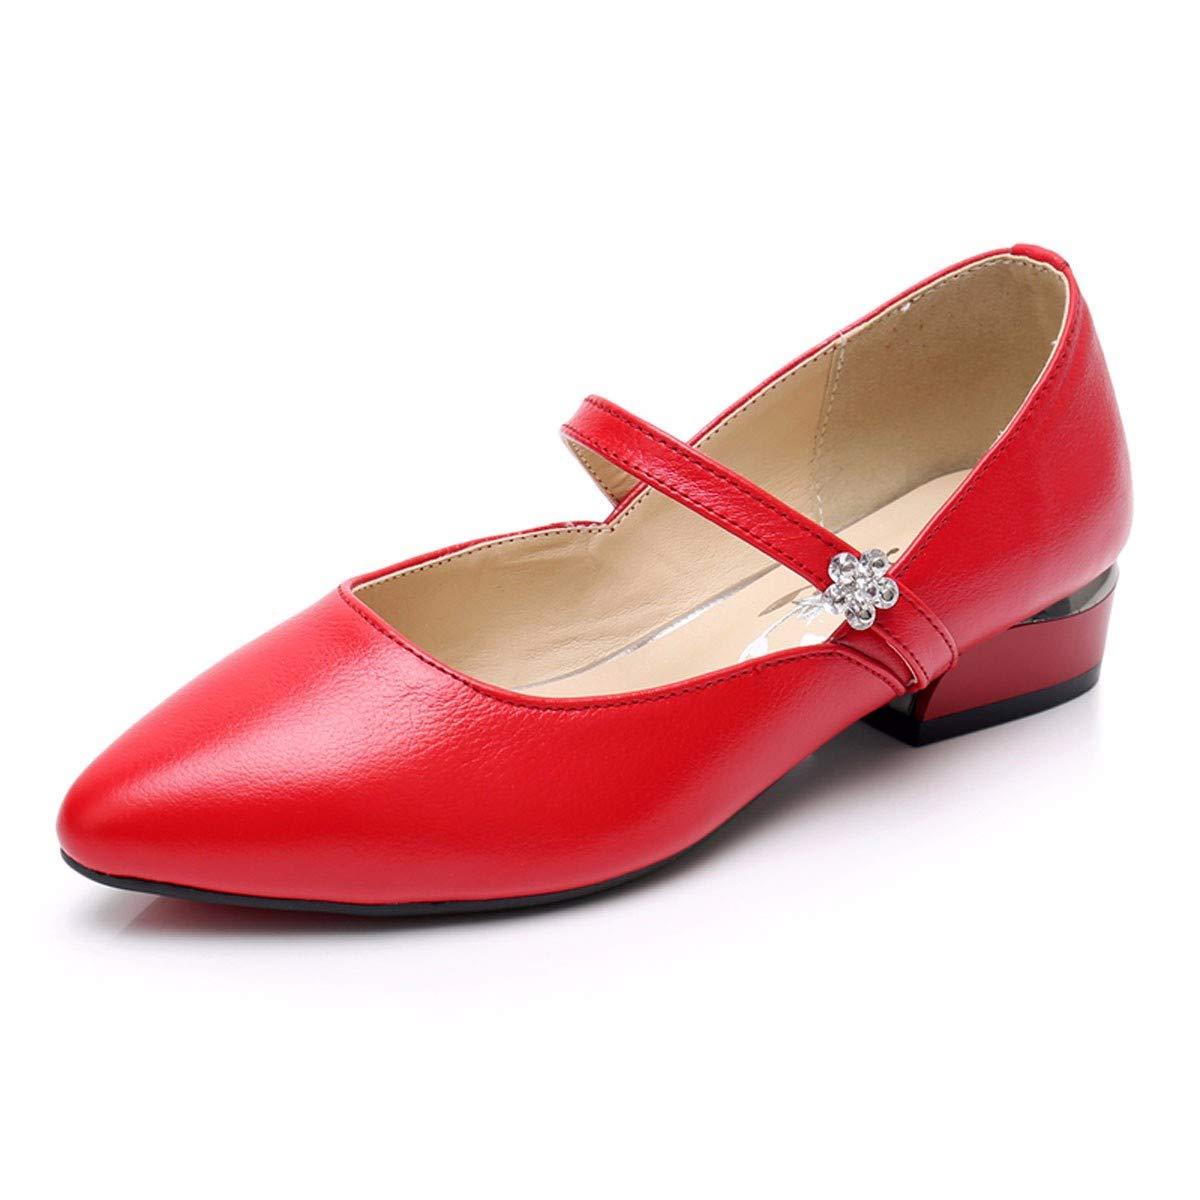 KPHY Damenschuhe/Weiche Grund Gesagt Schuhe Kleine Lederschuhe Flache Schuhe Leder Niedrige Schuhe Herbst Niedrige Leder Absätze.34 des - 490763